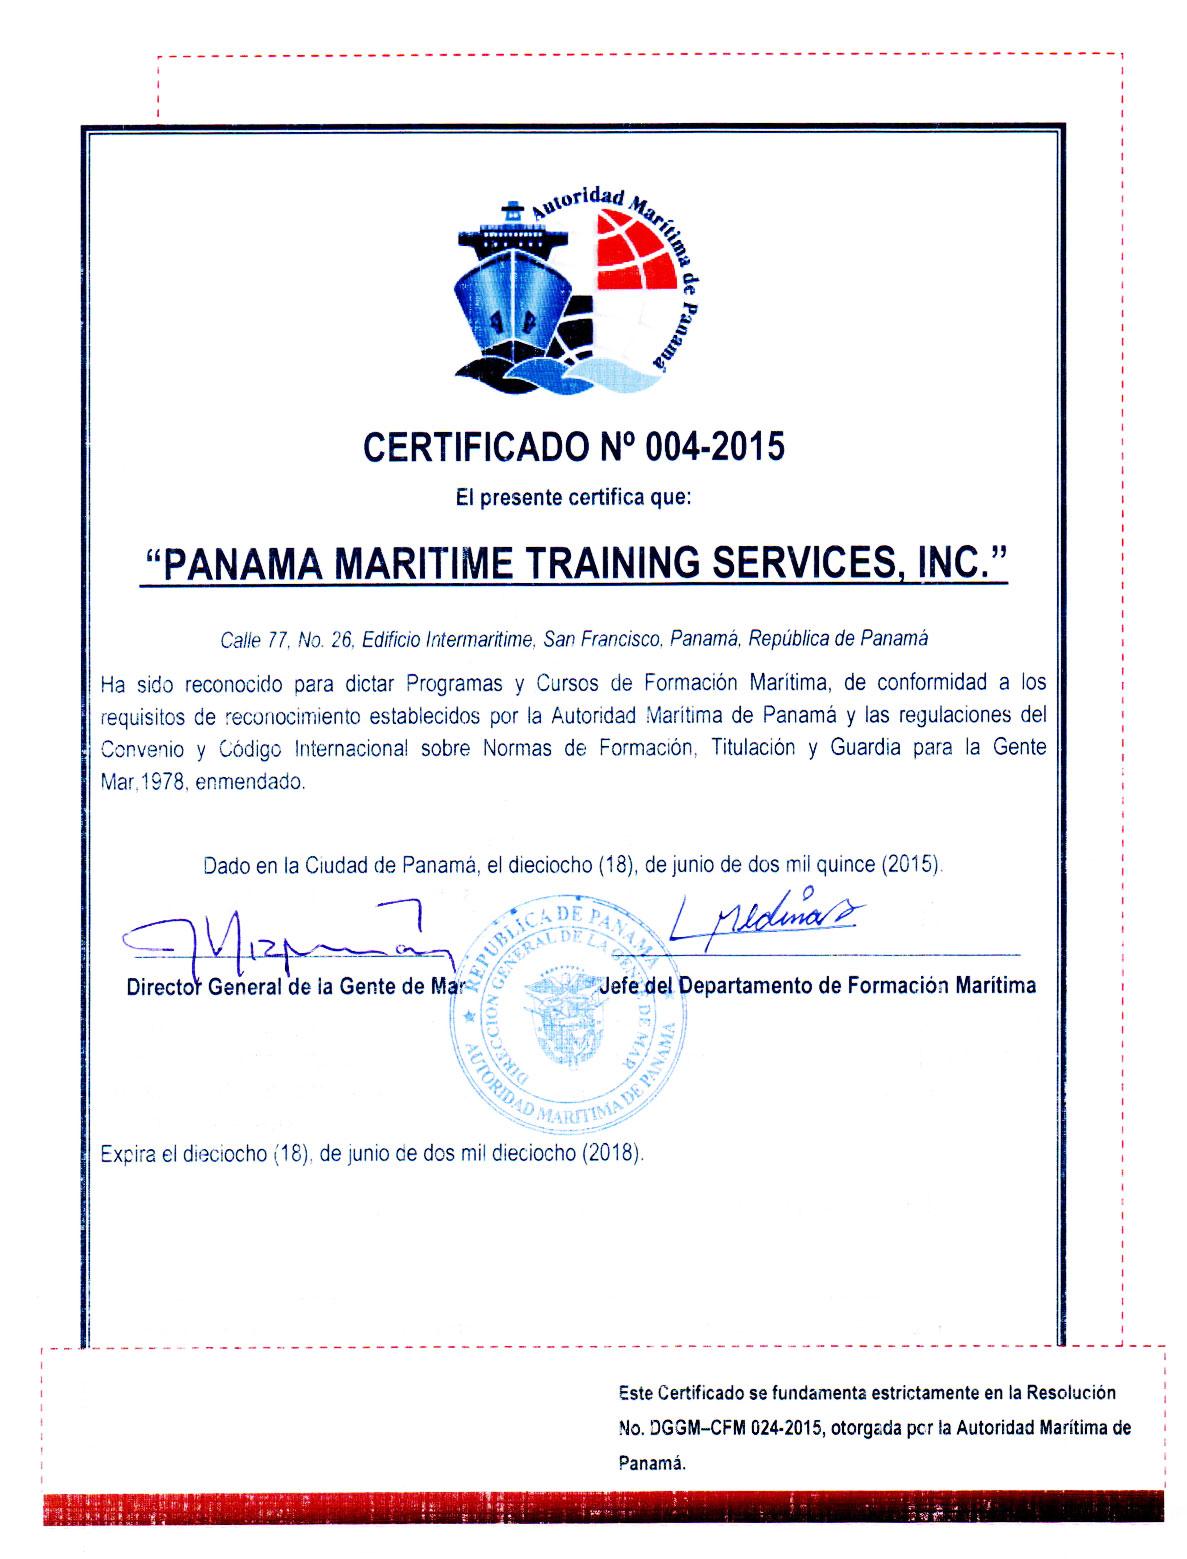 Panama maritime training services authentication certificate authorization certificate pmts 2016 1betcityfo Choice Image